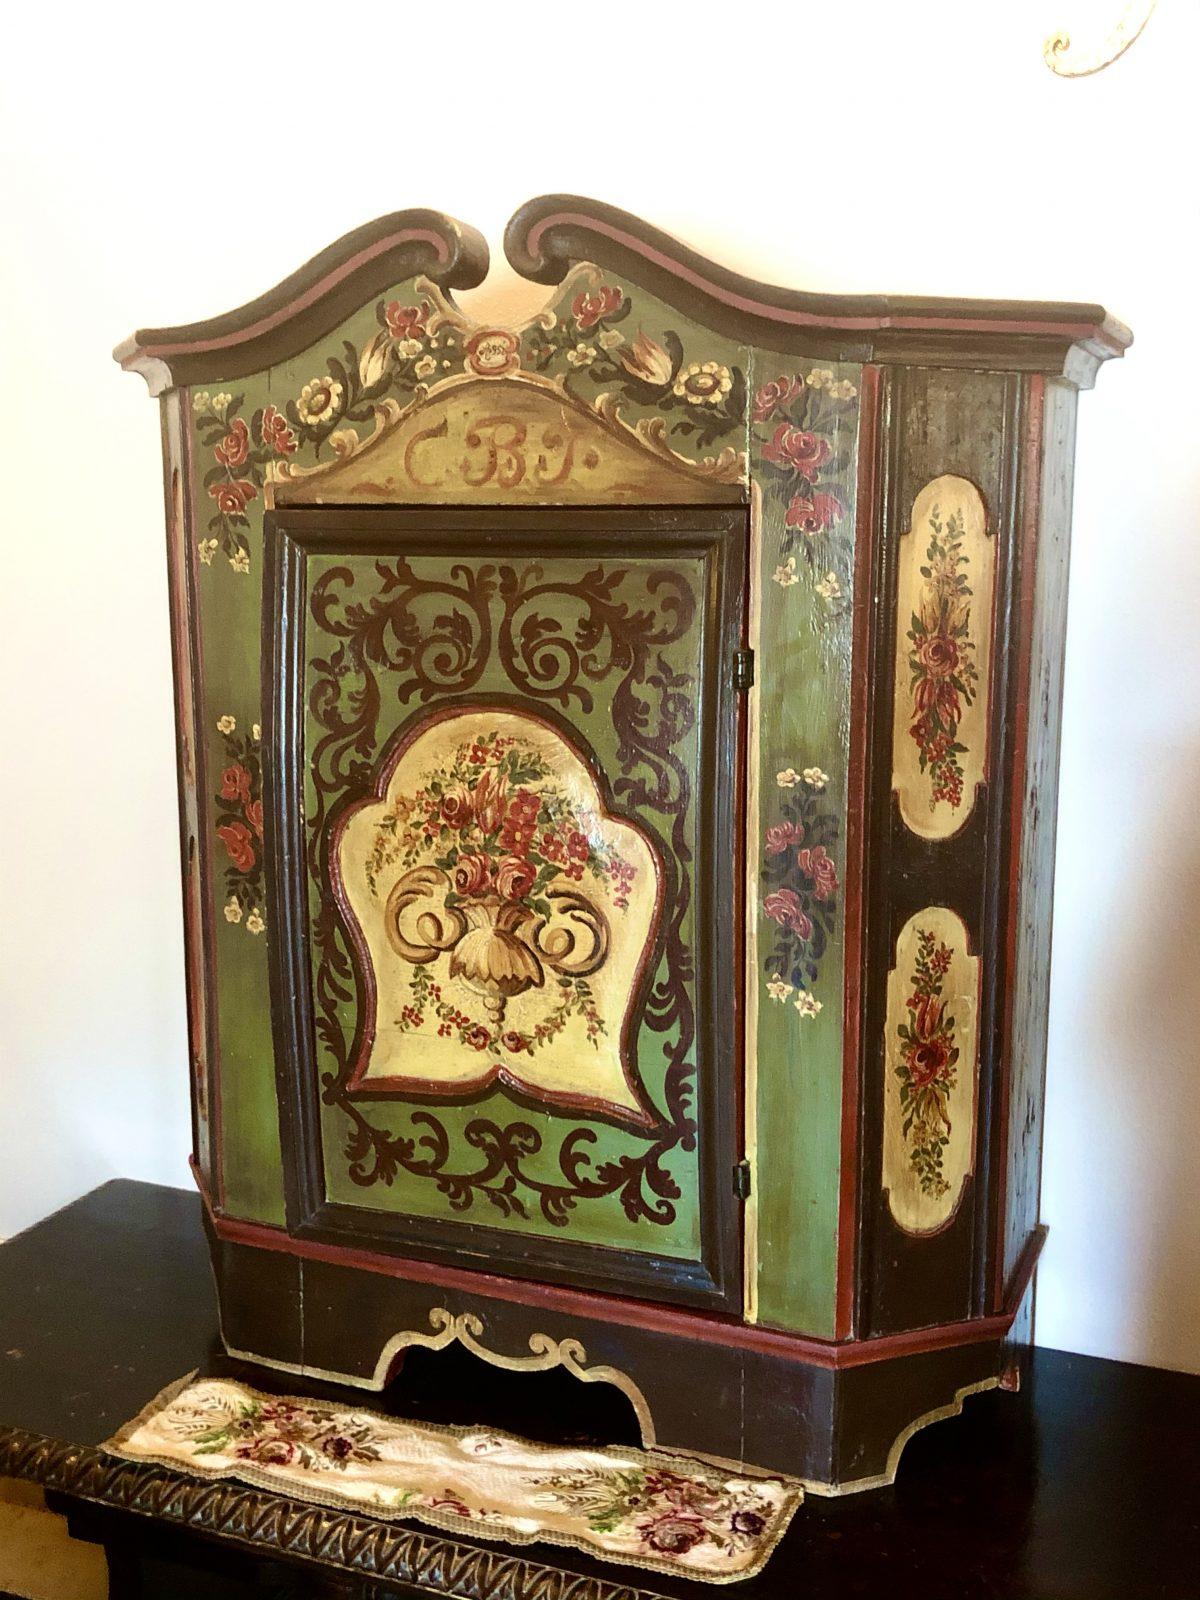 Bauernmoebel, painted folkart furniture